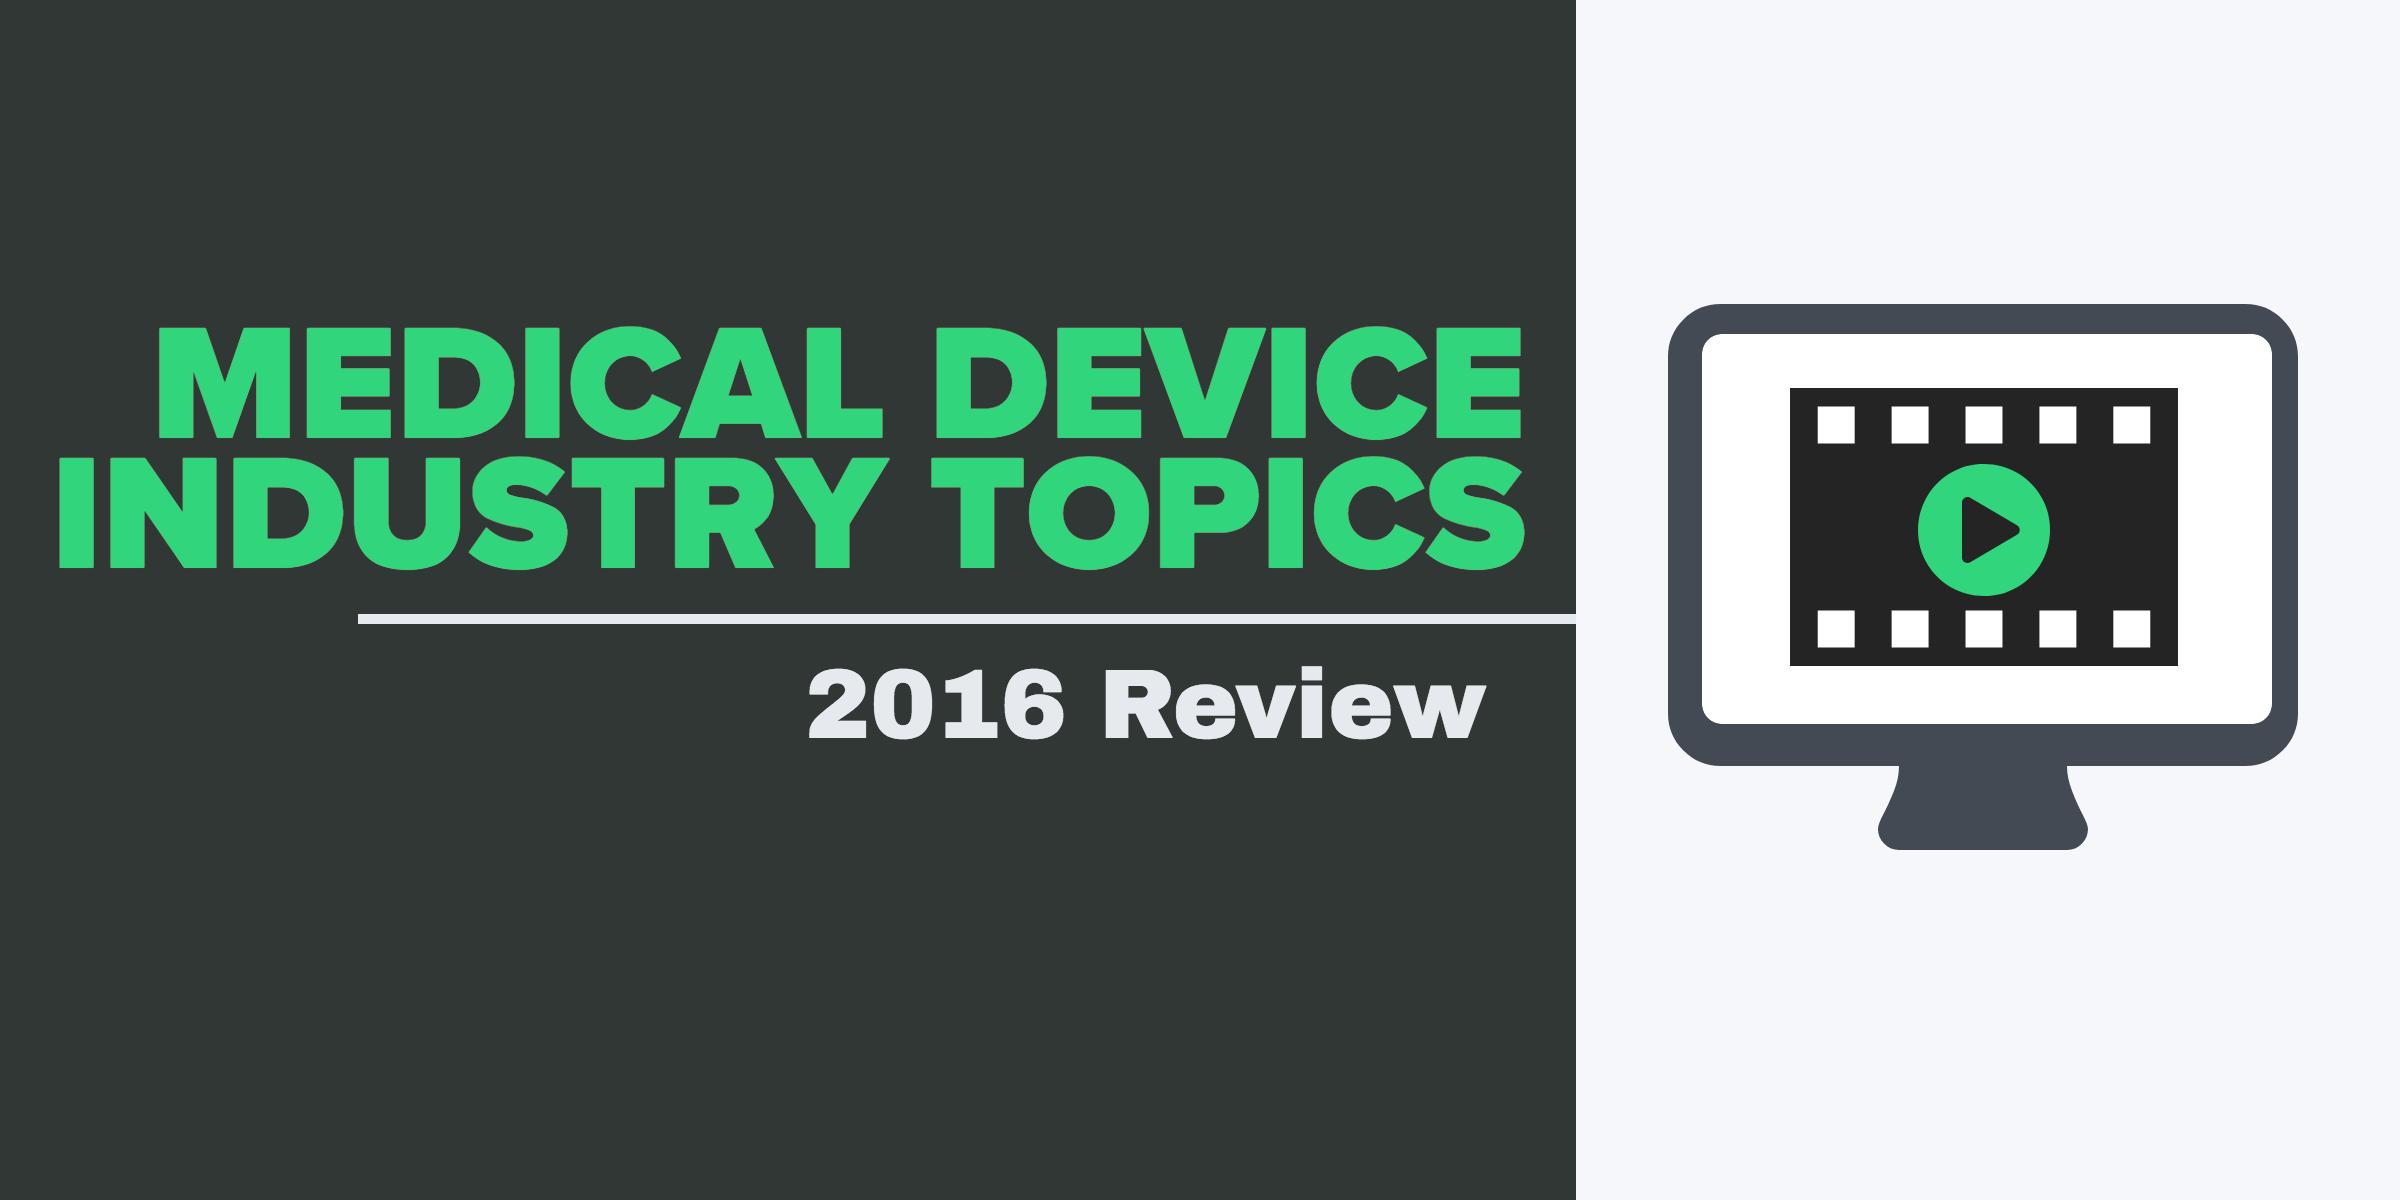 2016_medical_device_industry_topics copy (1)